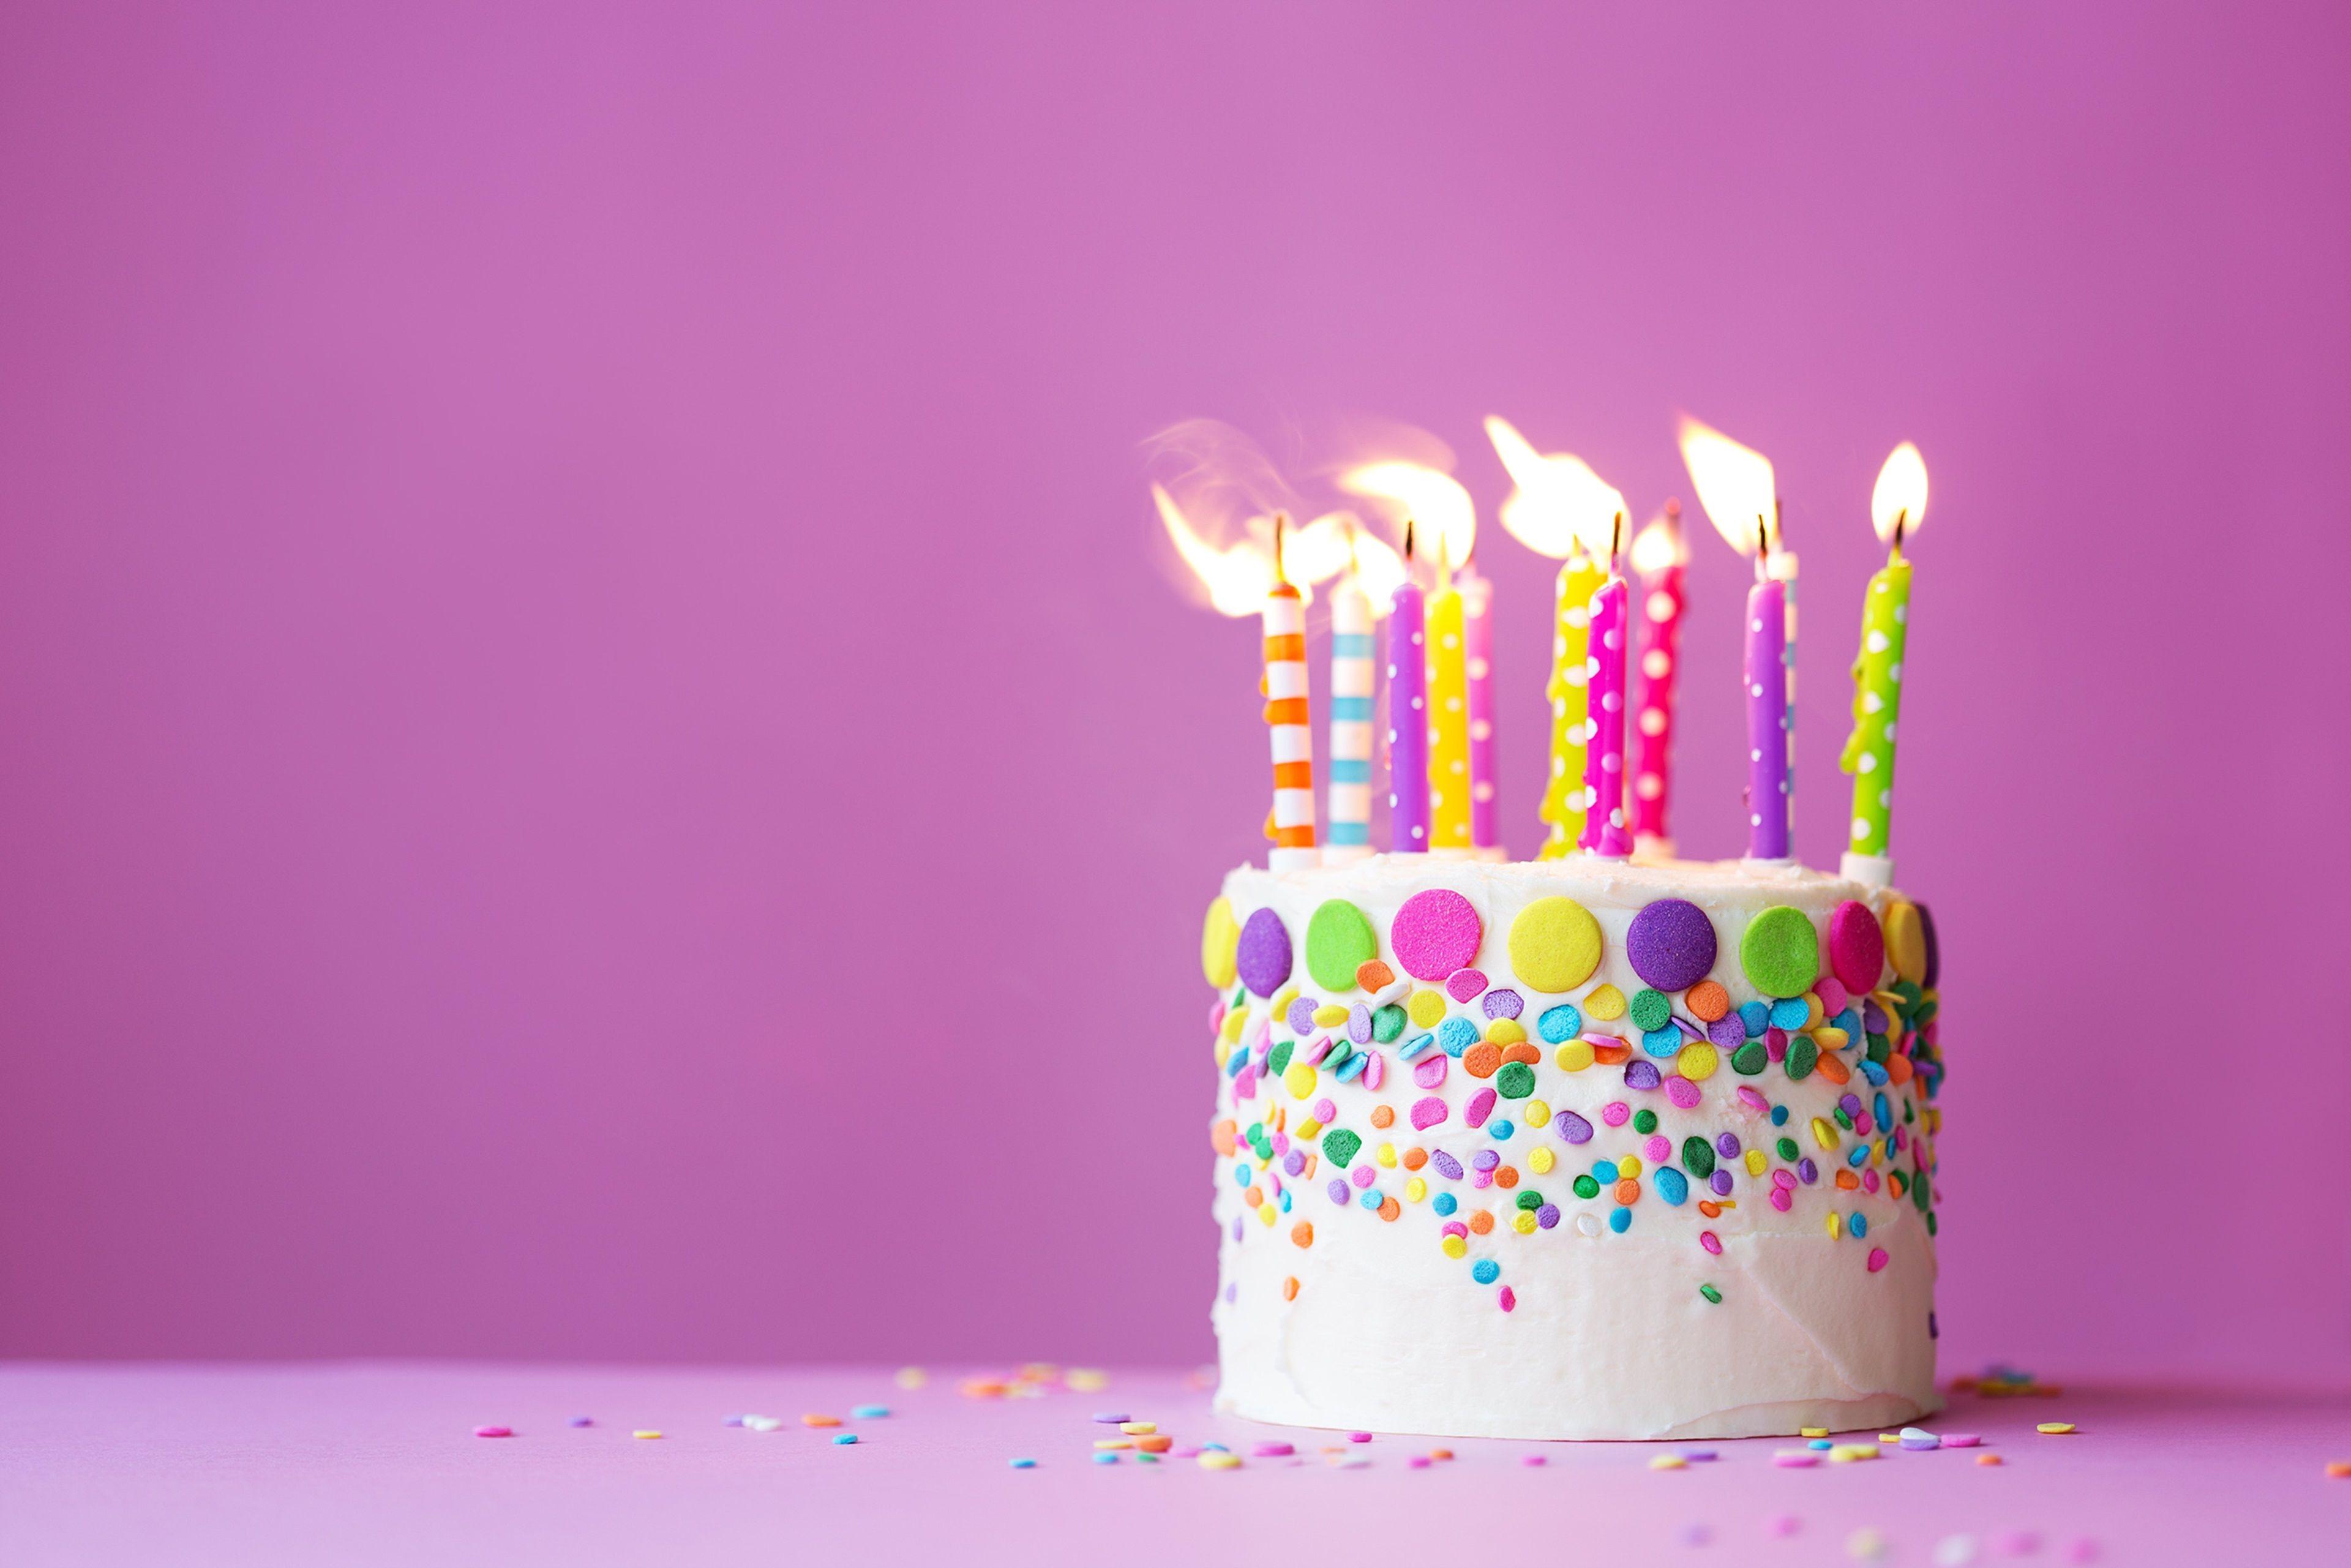 Happy Birthday 4k HD Wallpapers Free